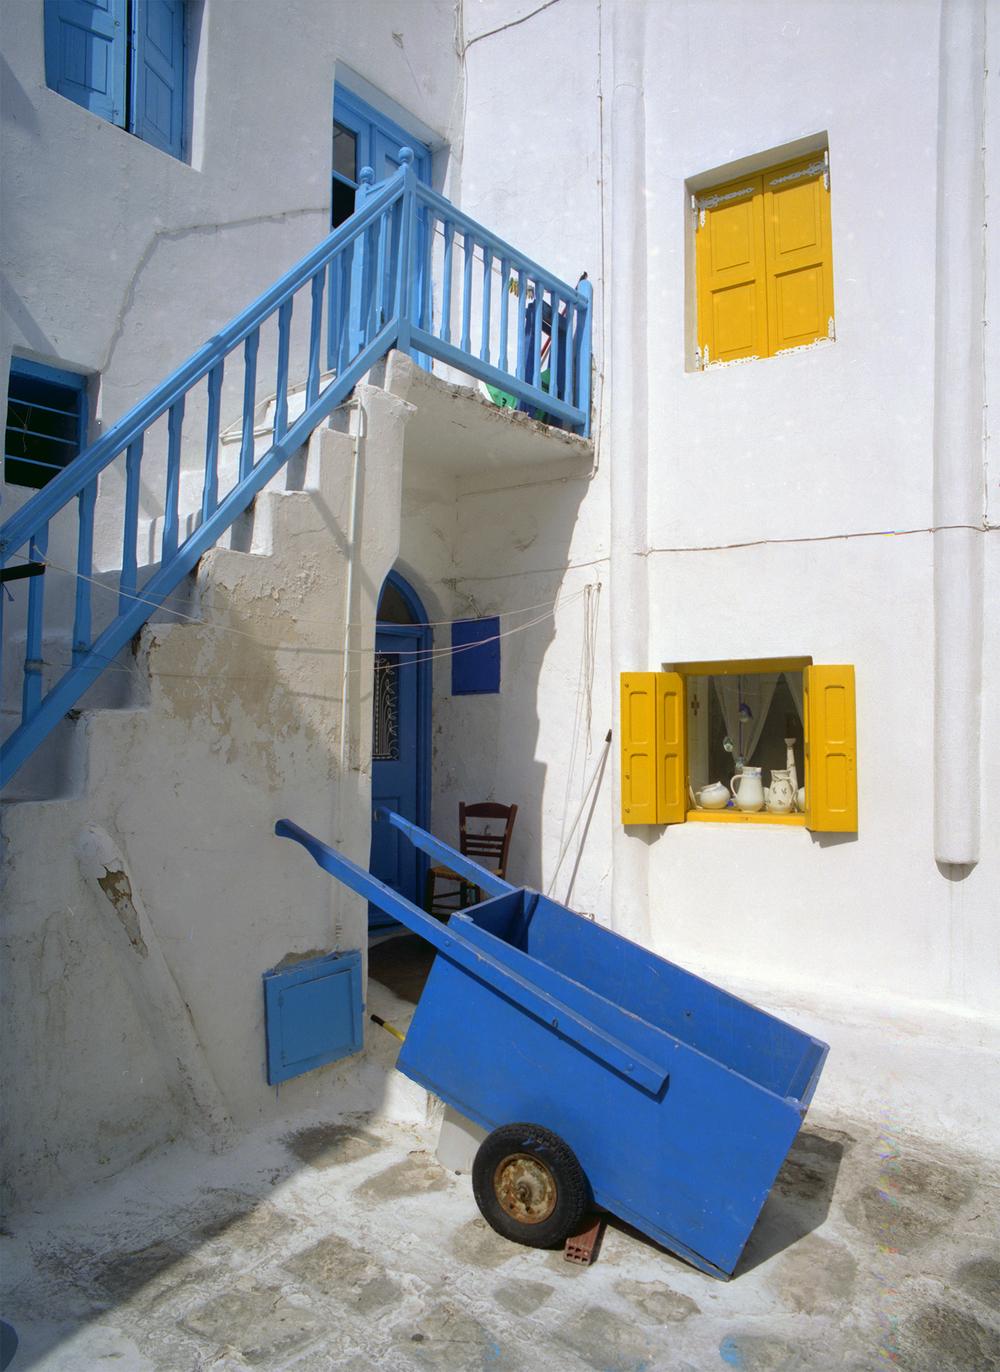 The Blue Cart